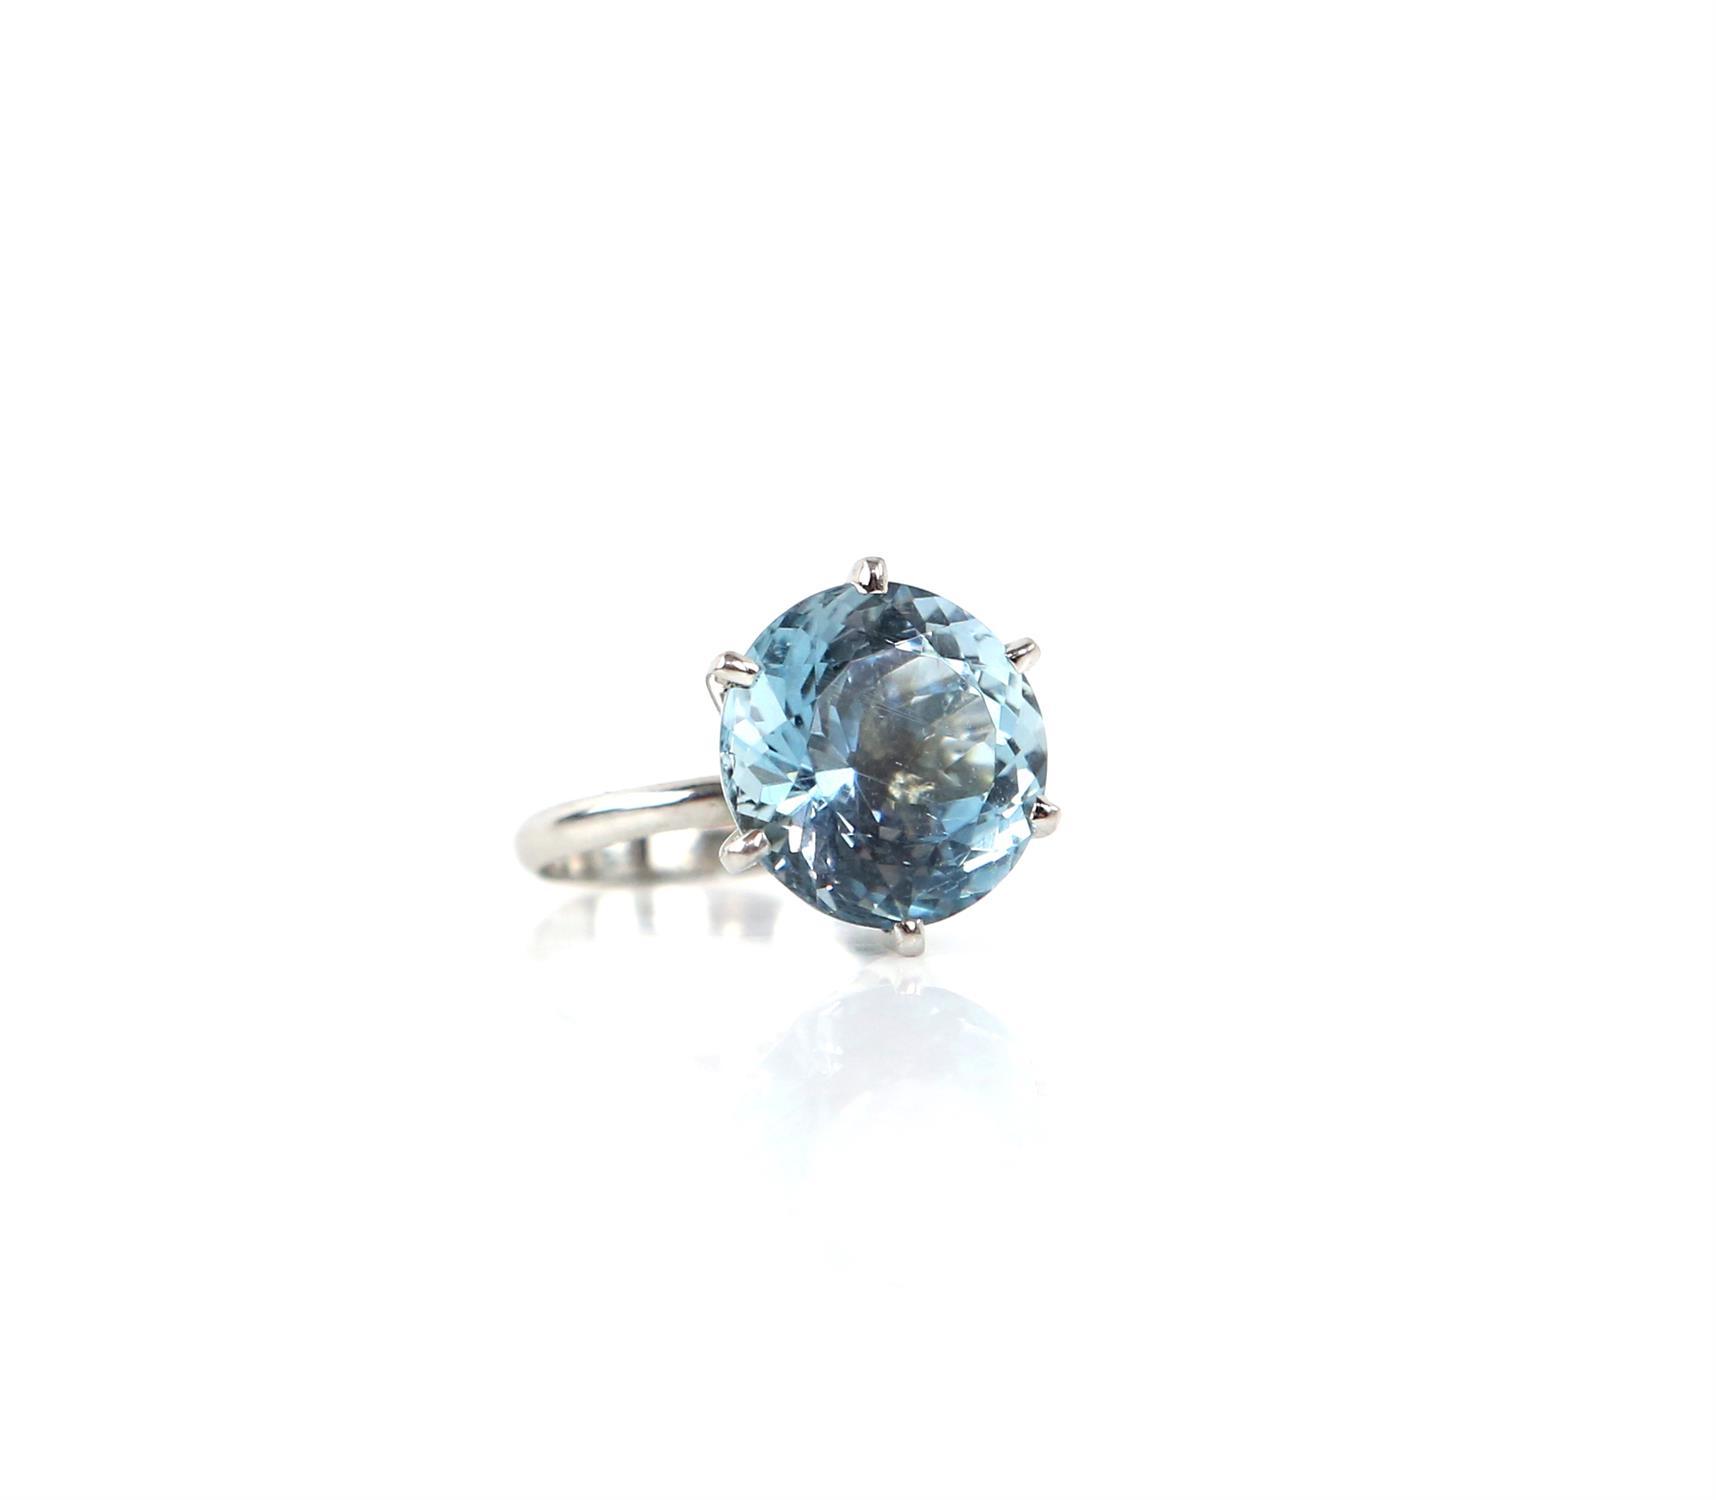 Aquamarine ring, round cut aquamarine, estimated weight 8.80 carats, mount testing as 18 ct, - Image 4 of 9